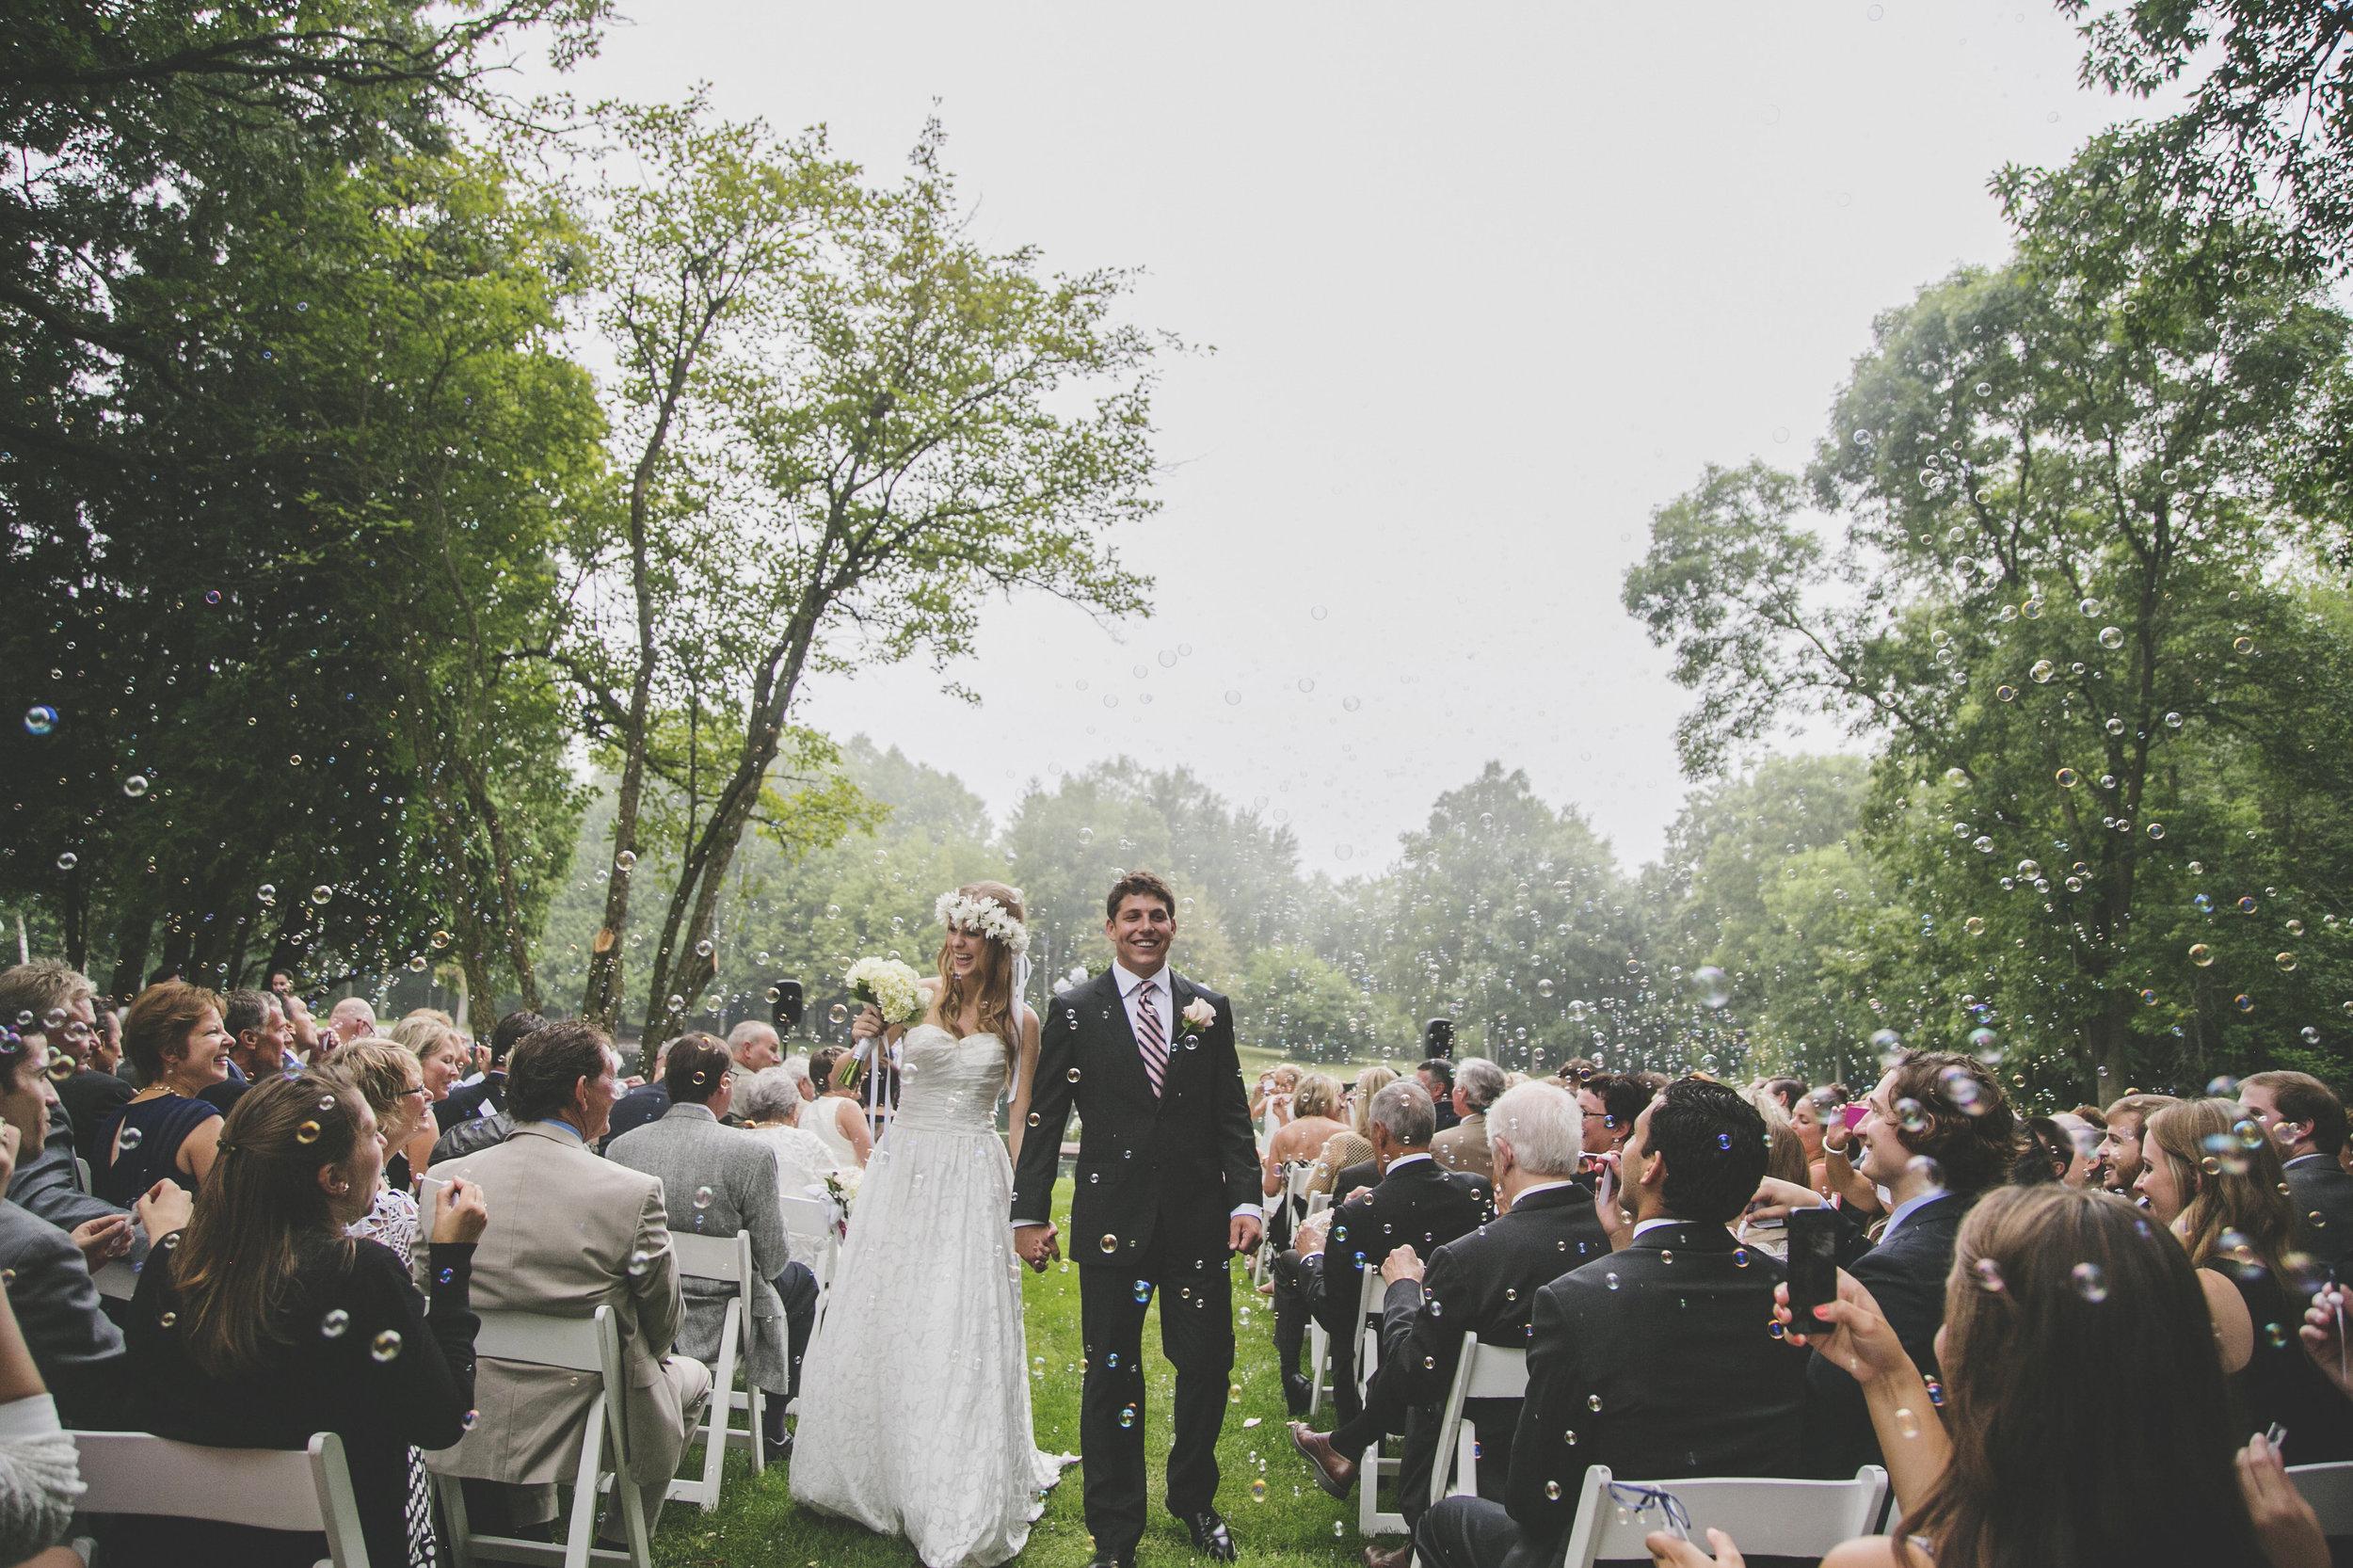 rrp+d_dalma+brian_wedding_204.JPG